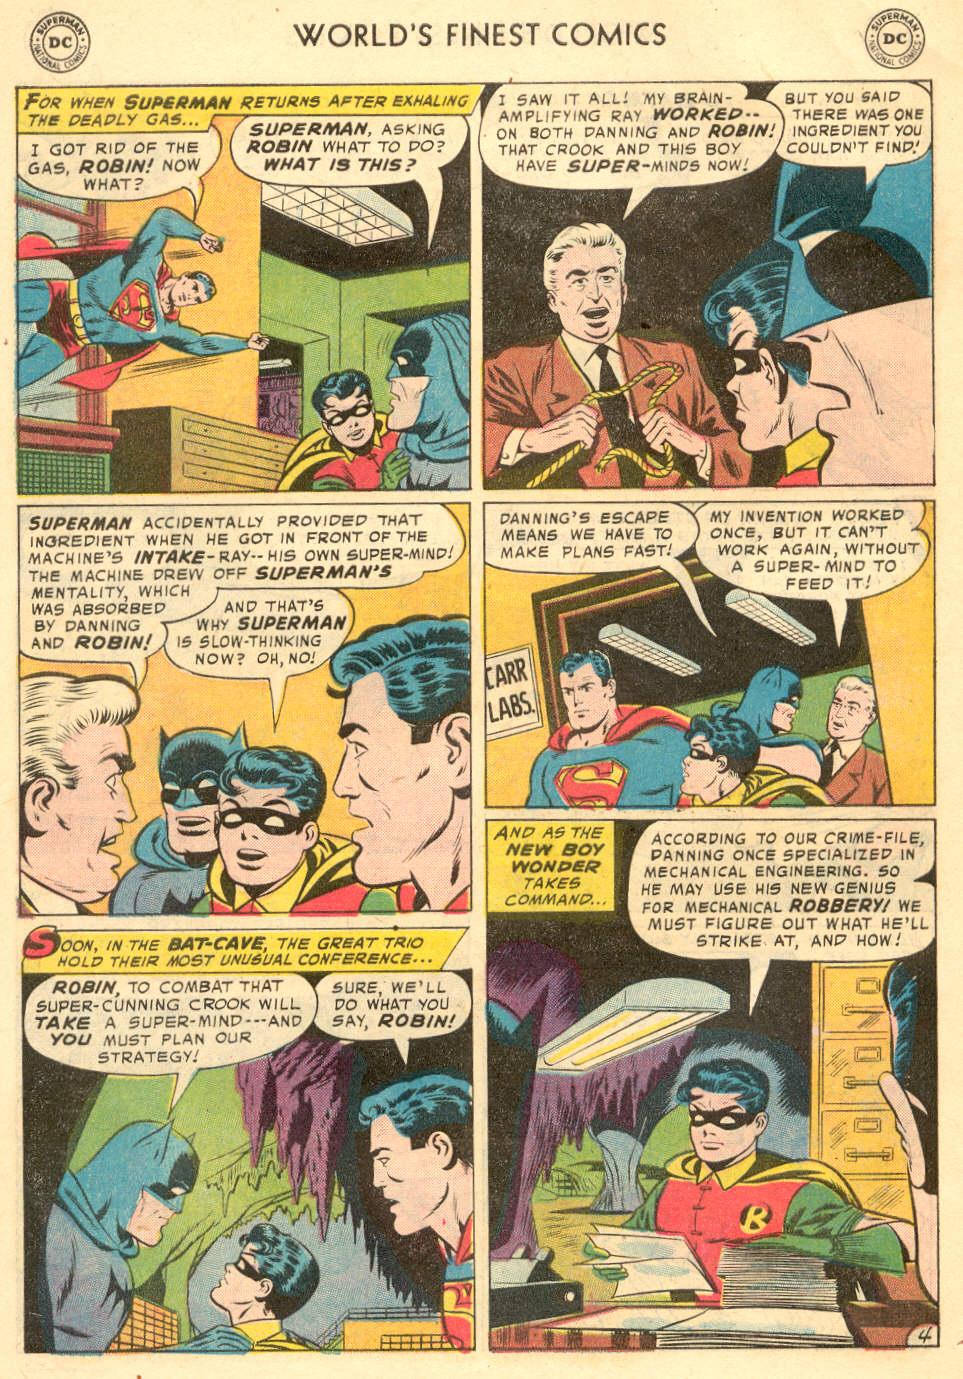 Read online World's Finest Comics comic -  Issue #93 - 6